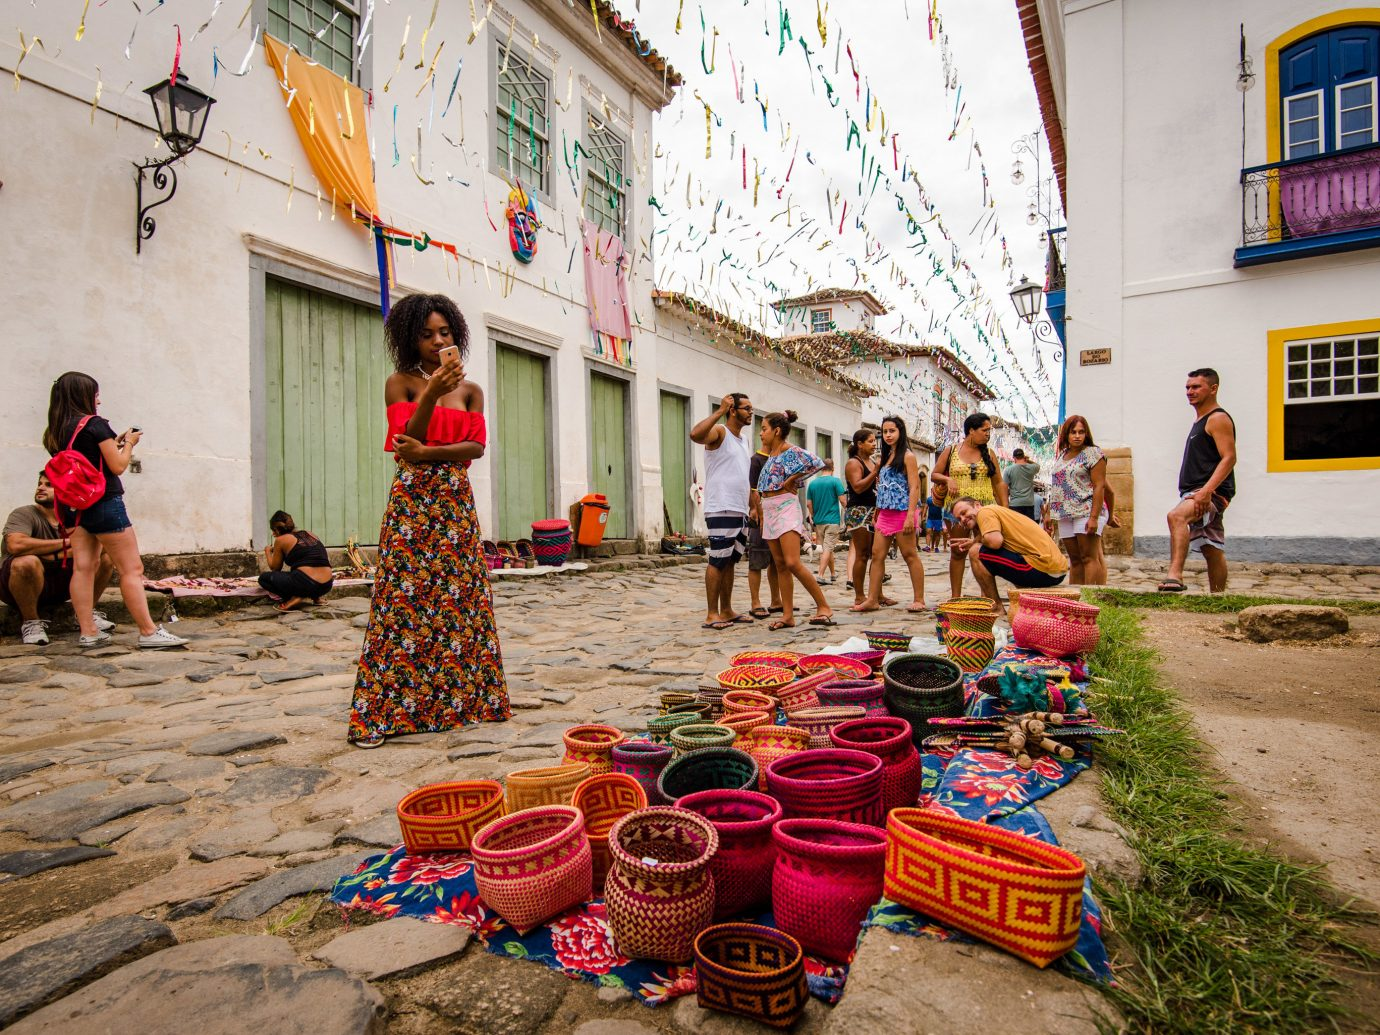 Beaches Brazil Trip Ideas ground outdoor scene way temple tourism street recreation sidewalk road girl